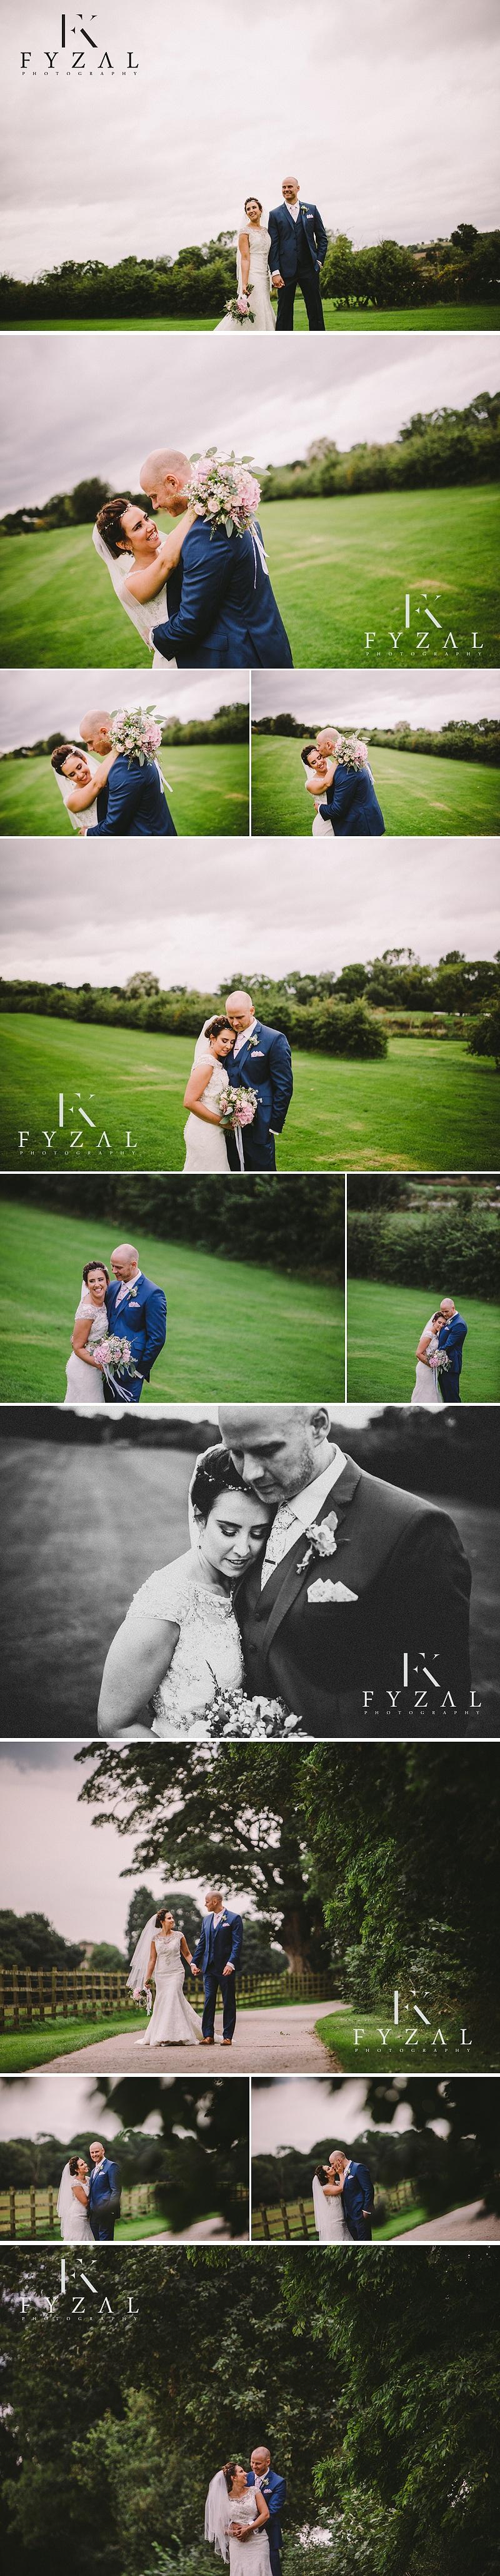 160924-Stacey-Tom-Wedding-07.jpg